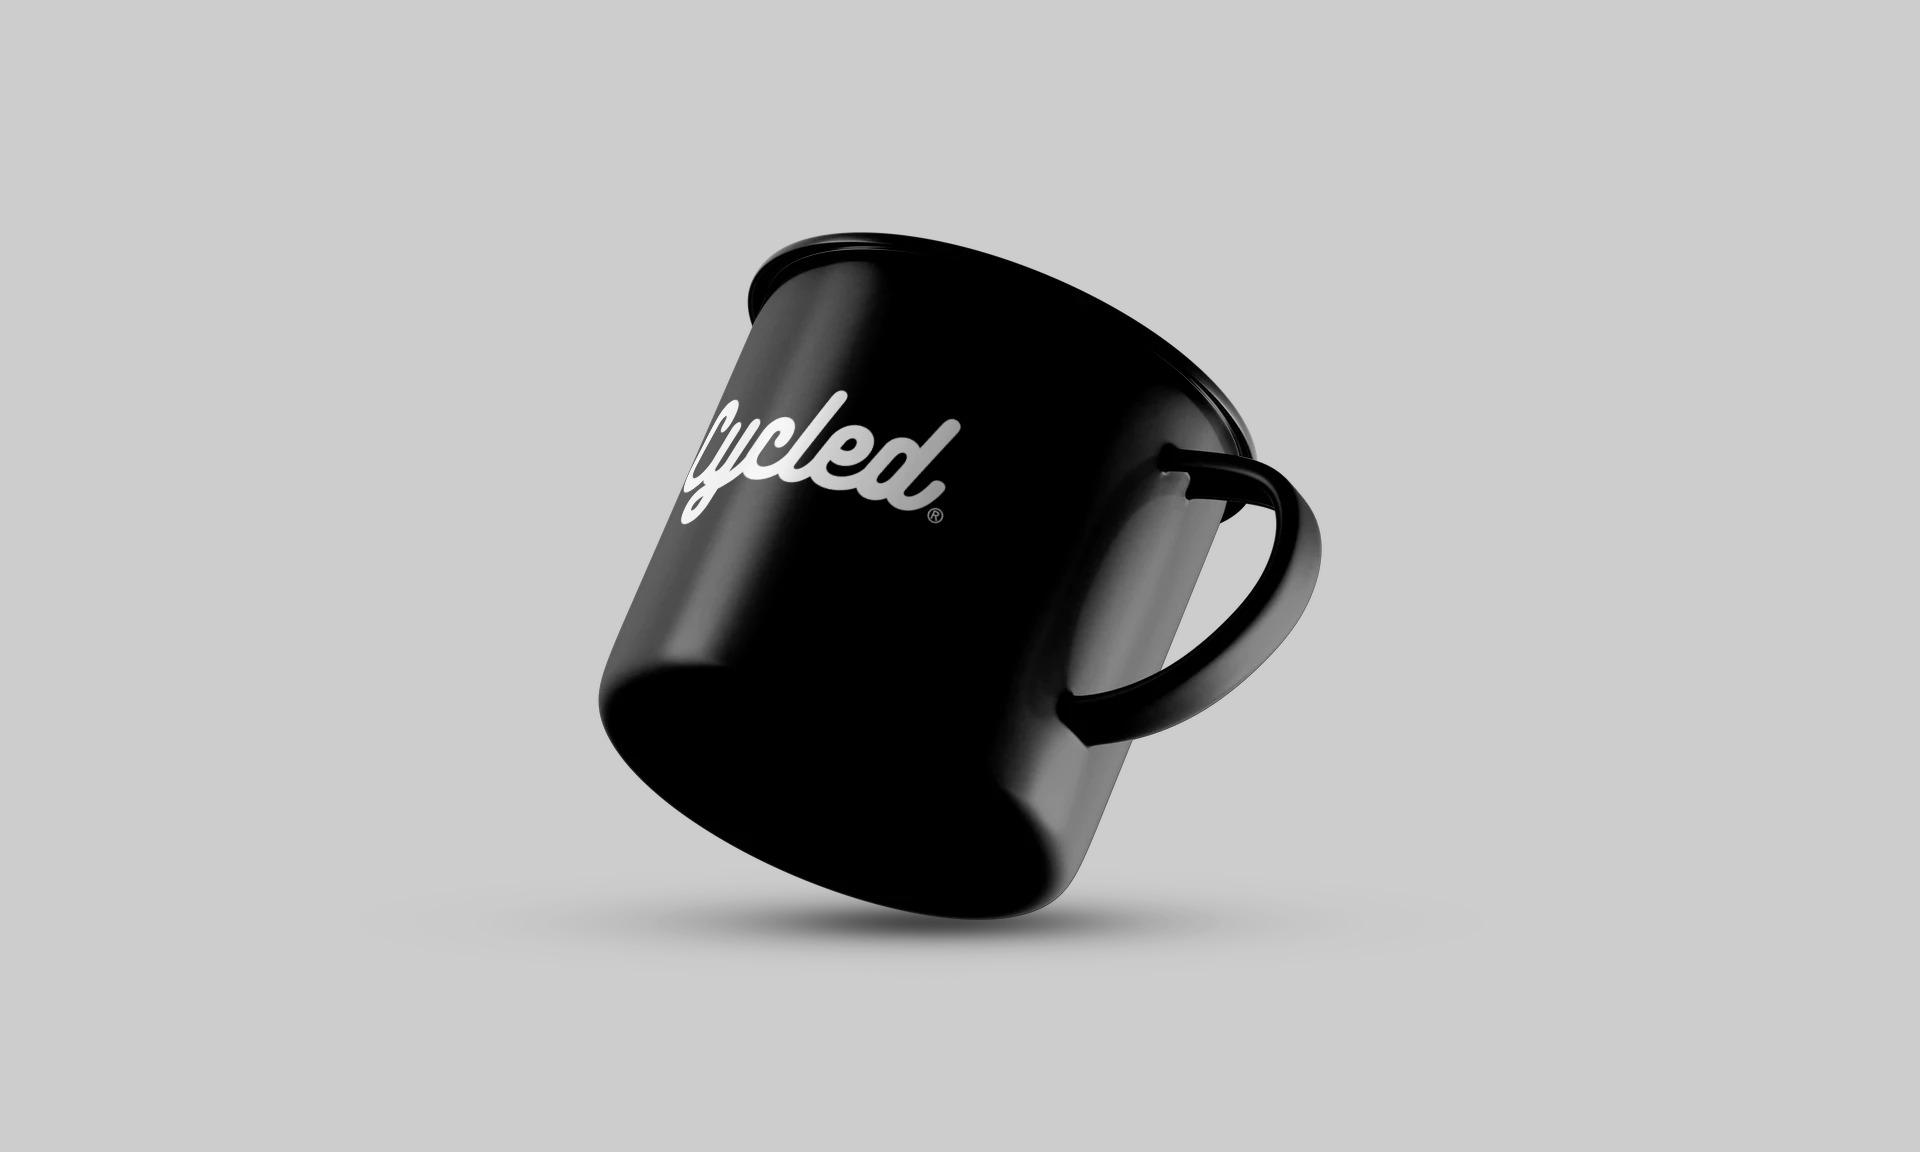 Cycled Mug